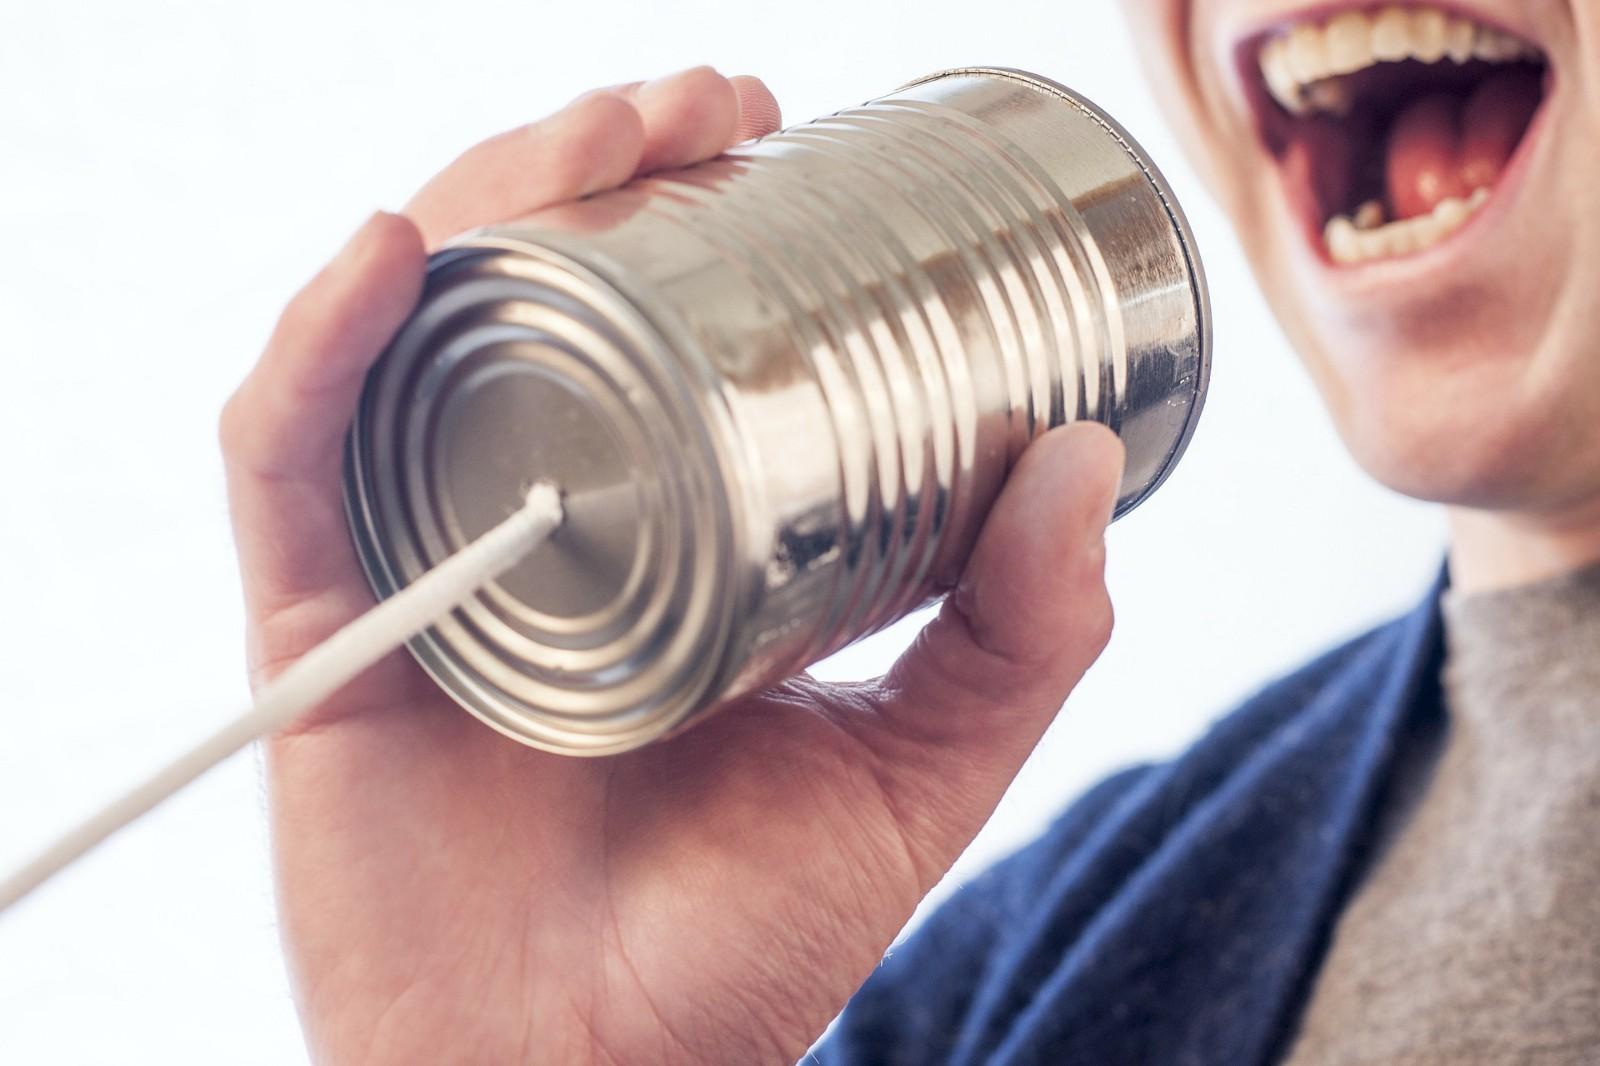 man speaking into metal can phone line, communication, public speaking, crosslead, washington dc